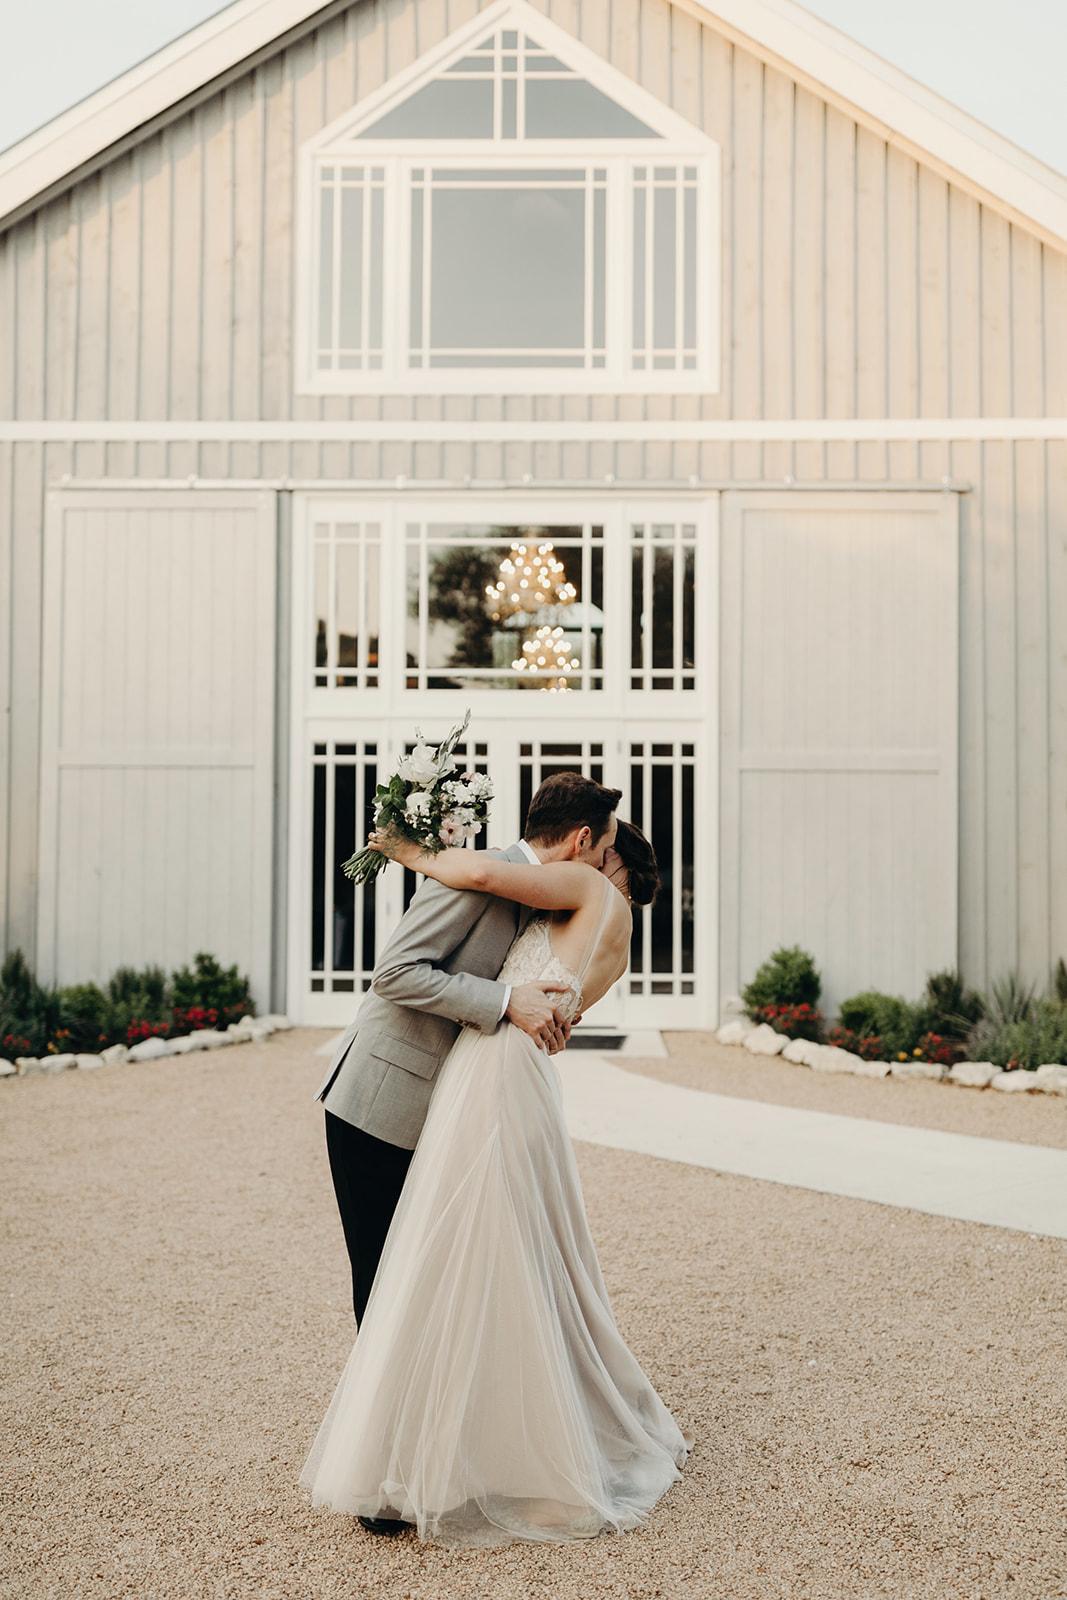 austin-wedding-lindsey-bryce-564.jpg